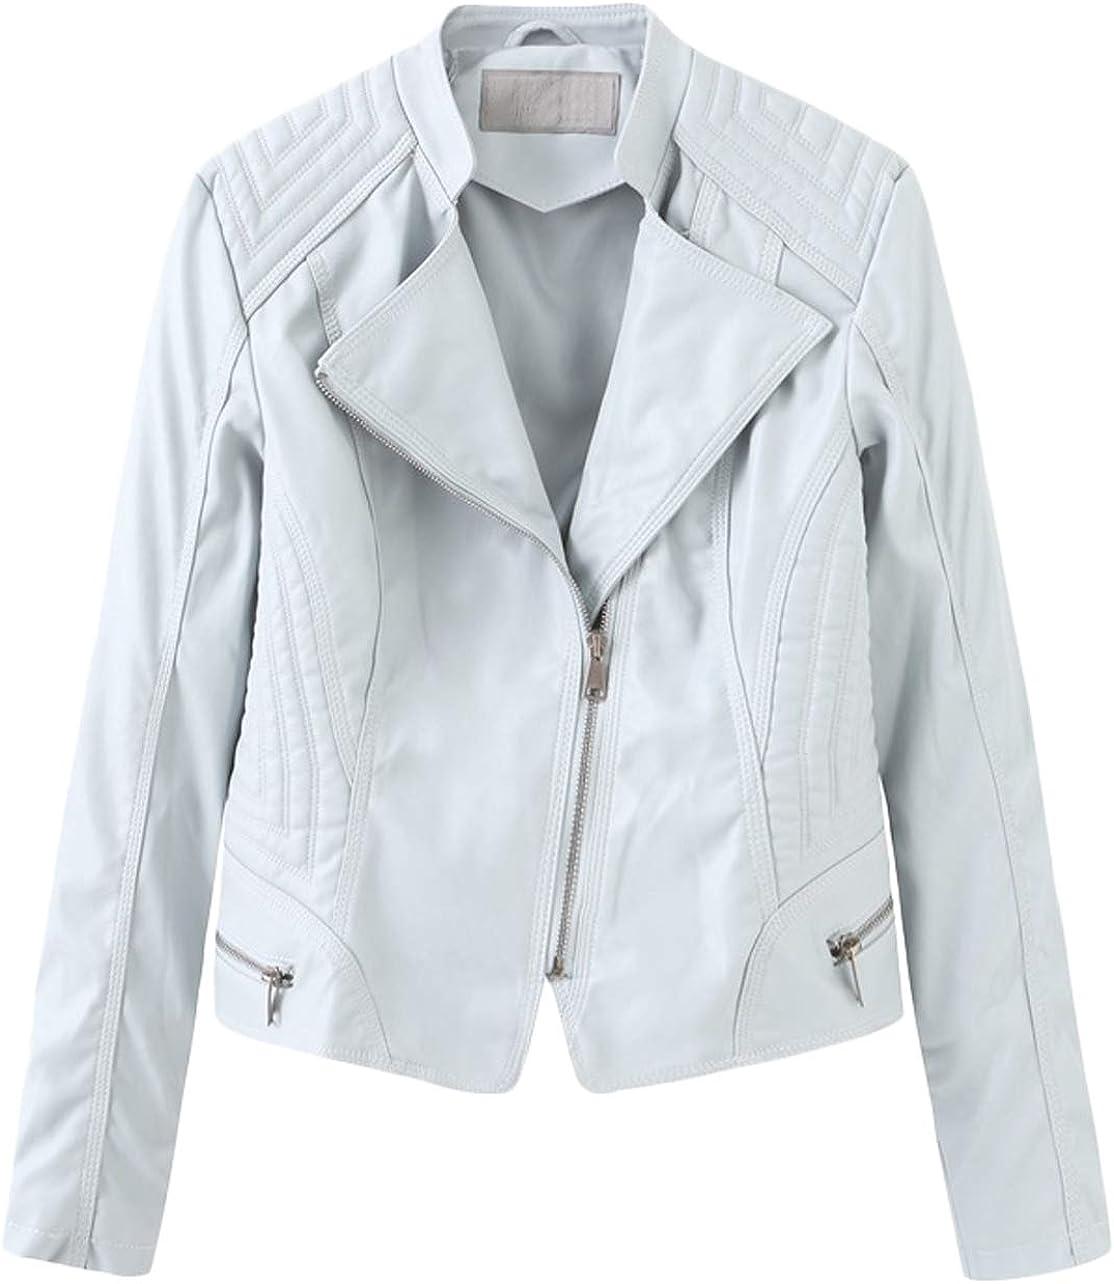 Youhan Women's PU Faux Leather Jacket Short Zip Up Motorcycle Coat